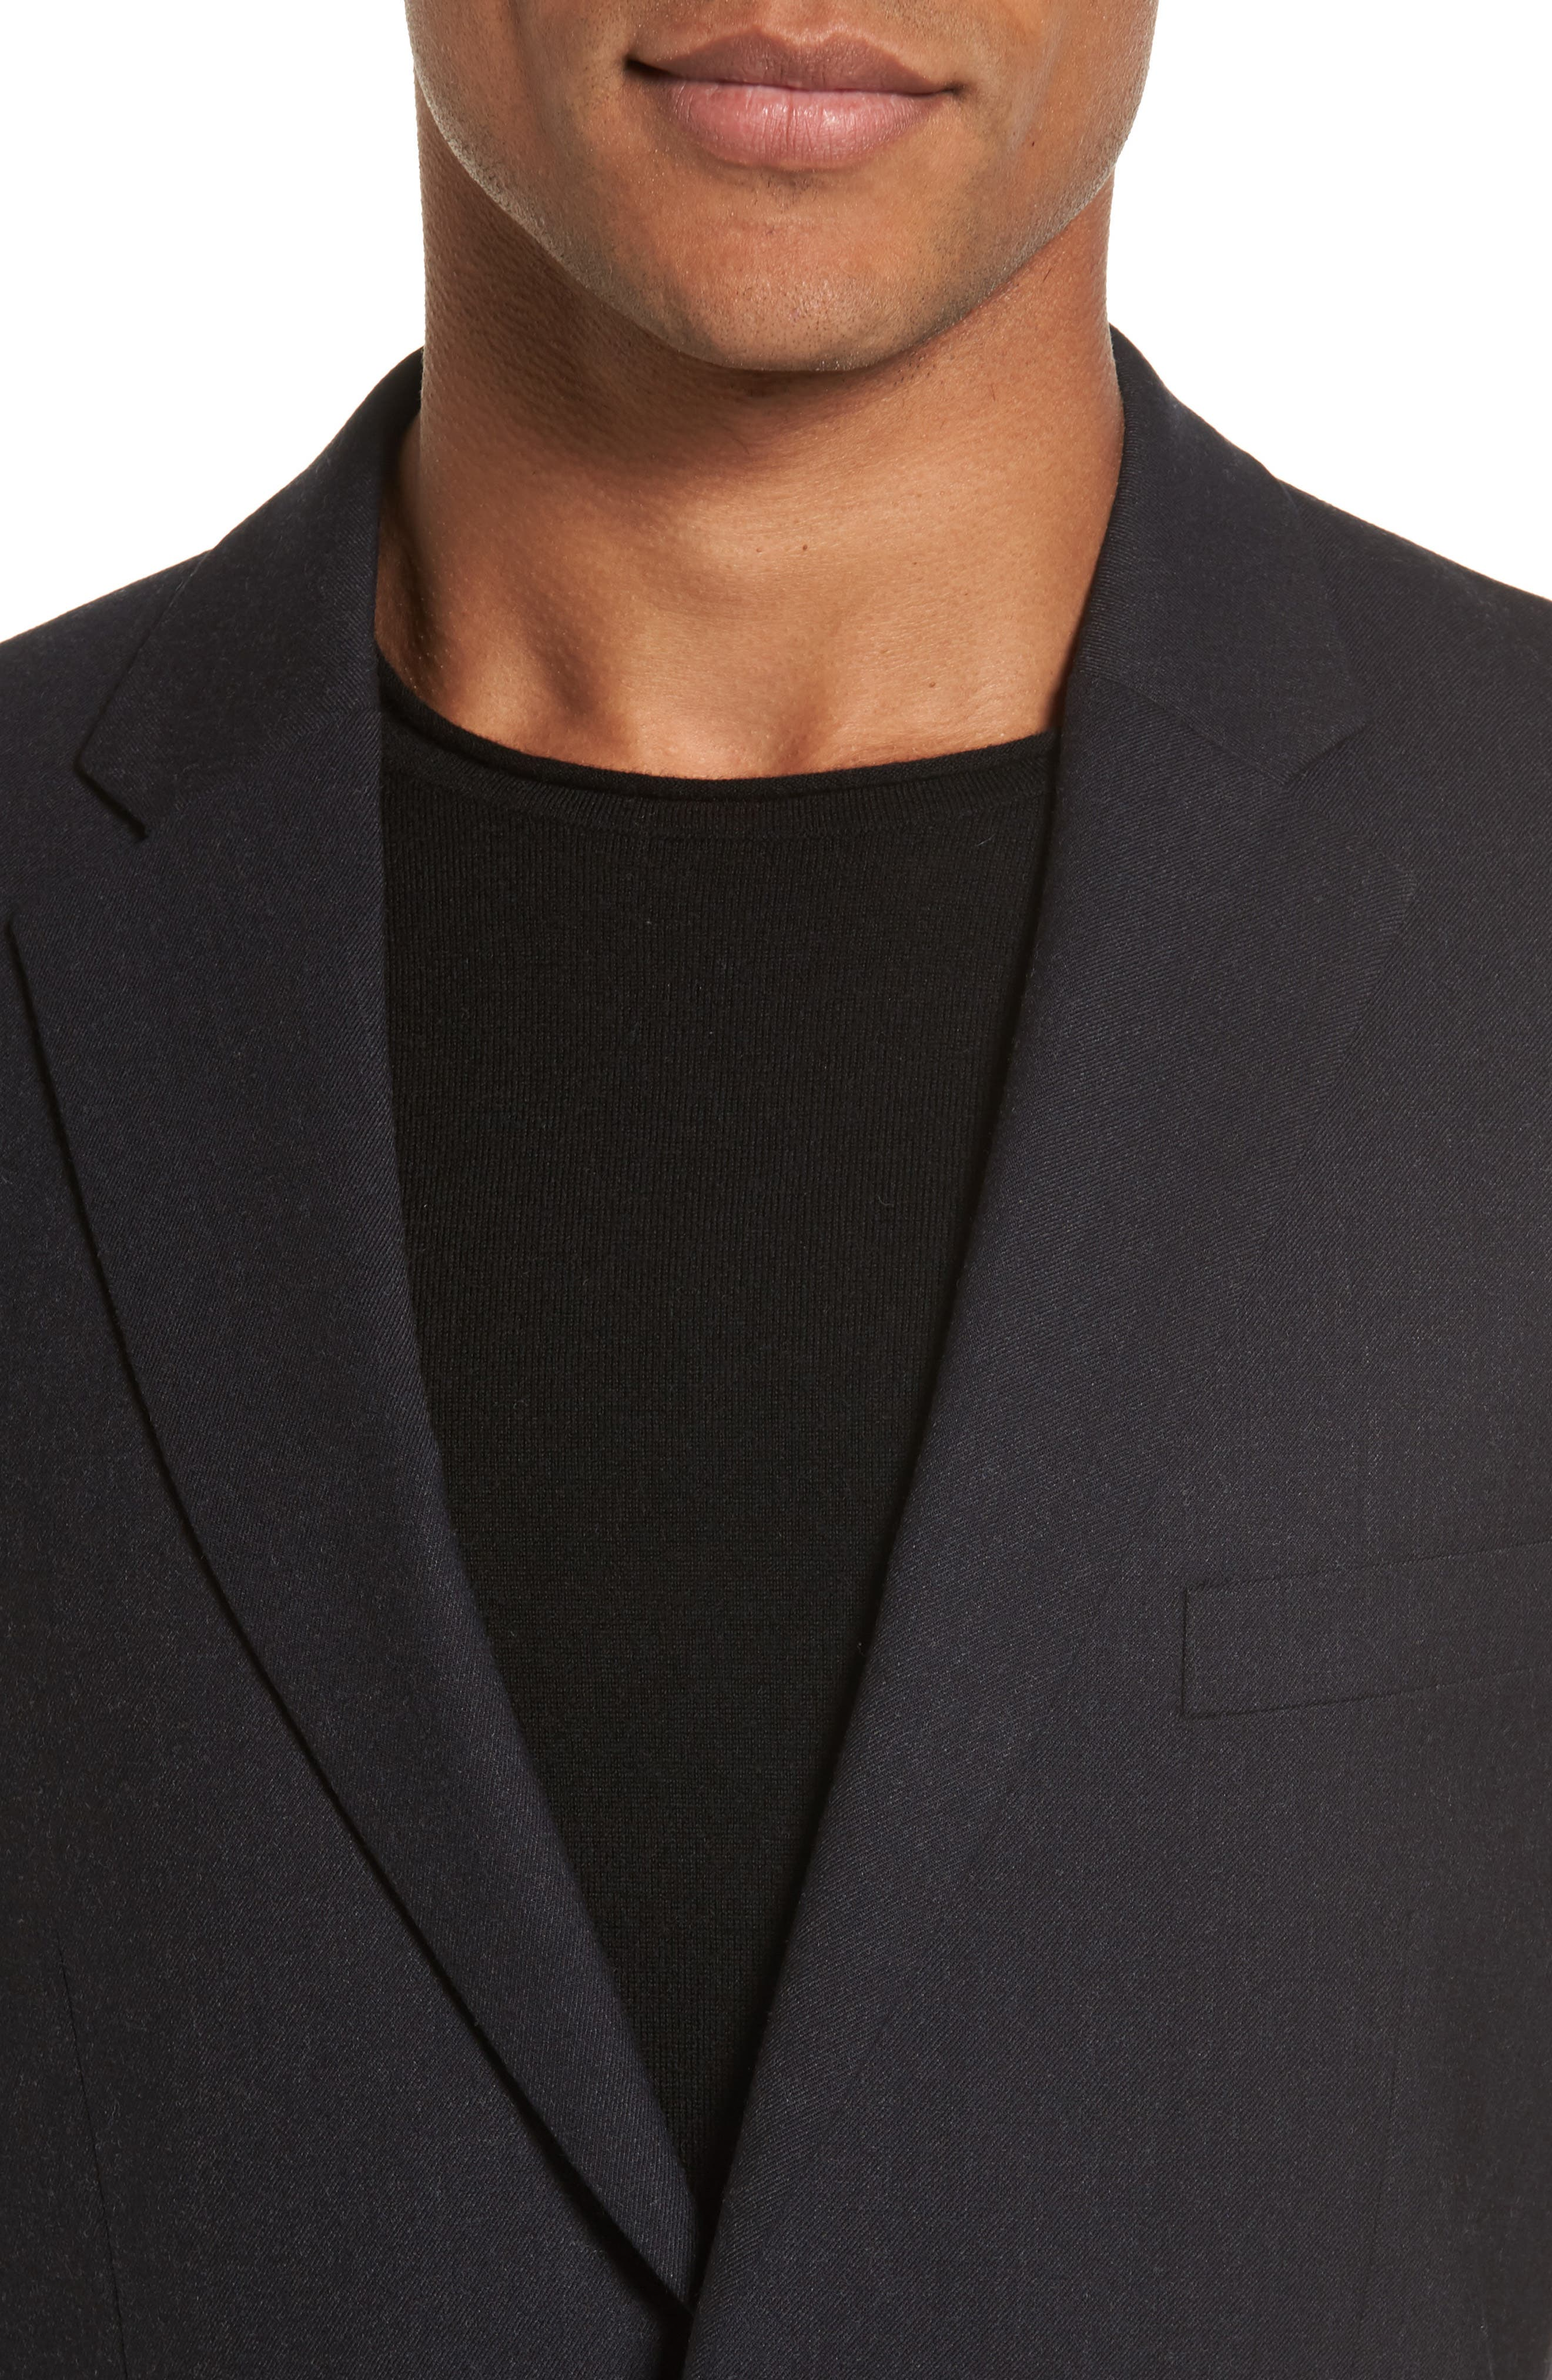 Regular Fit Blazer,                             Alternate thumbnail 4, color,                             Charcoal